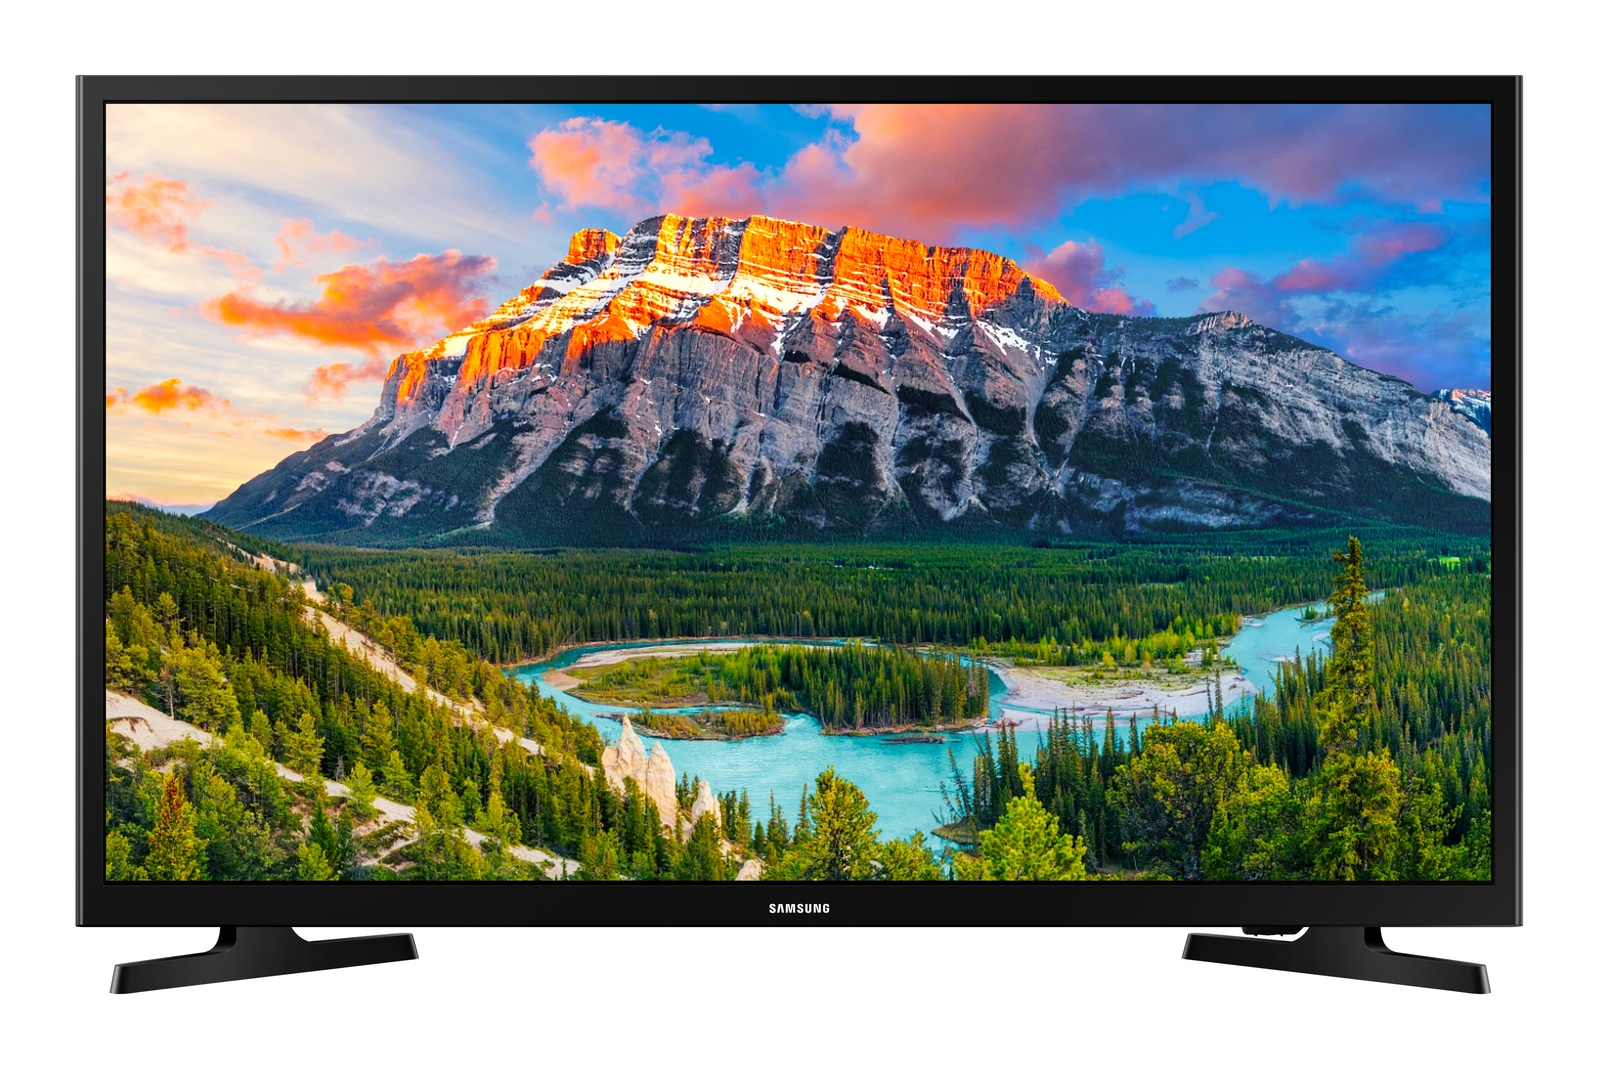 """Samsung 32"""" Class N5300 Smart Full HD TV (2018), GLOSSY BLACK"""